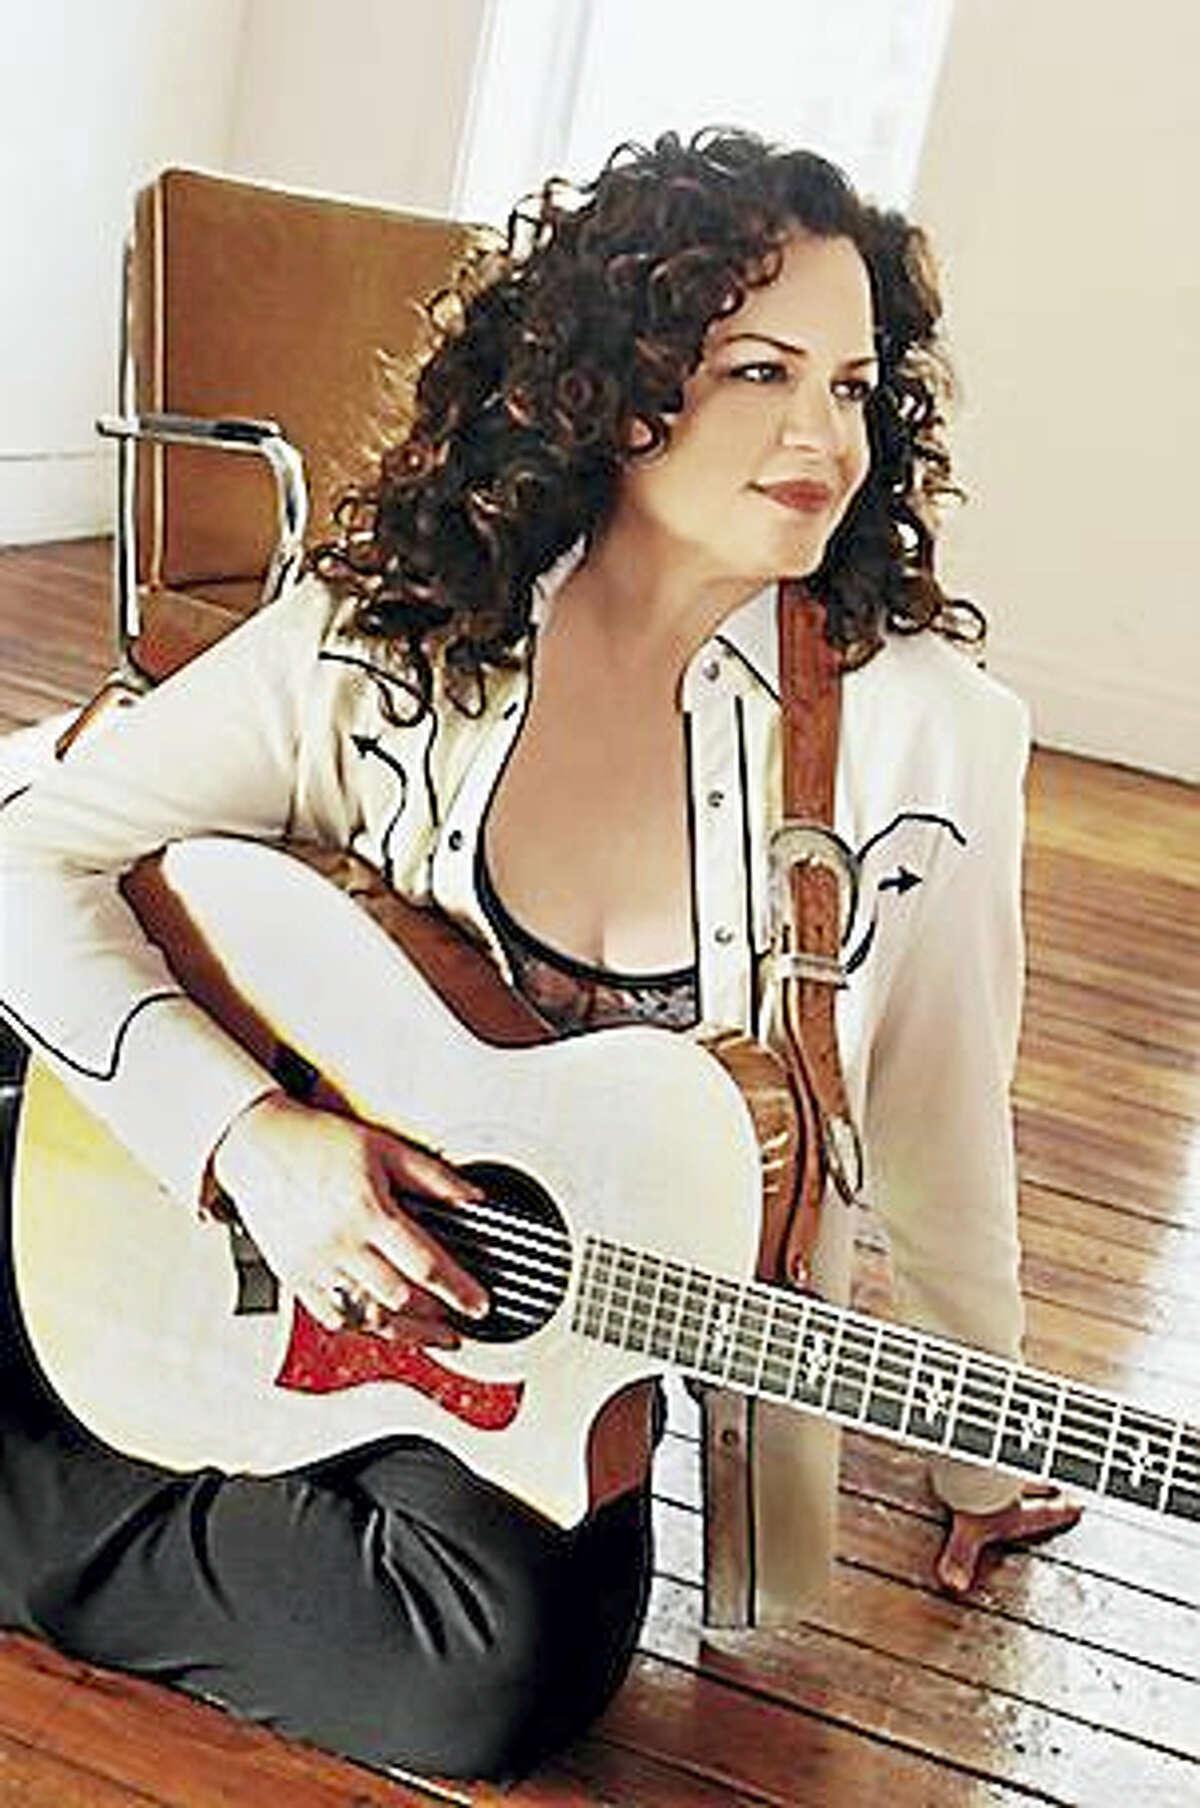 Contributed photo courtesy of Caroline DoctorowCaroline Doctorow joins the lineup of the Women of Folk concert at Bridge Street Live.